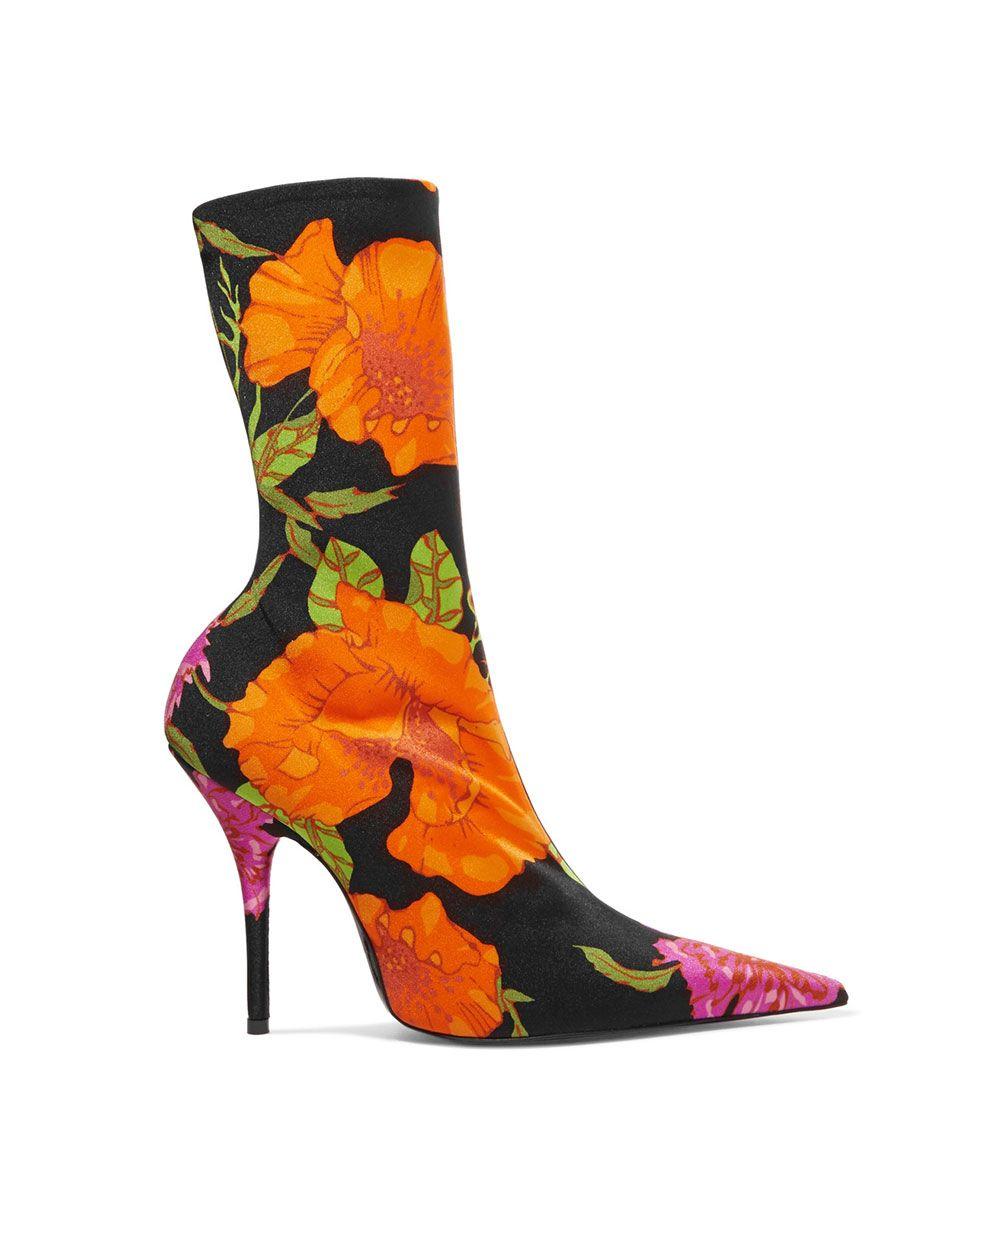 Balenciaga floral spandex ankle boots